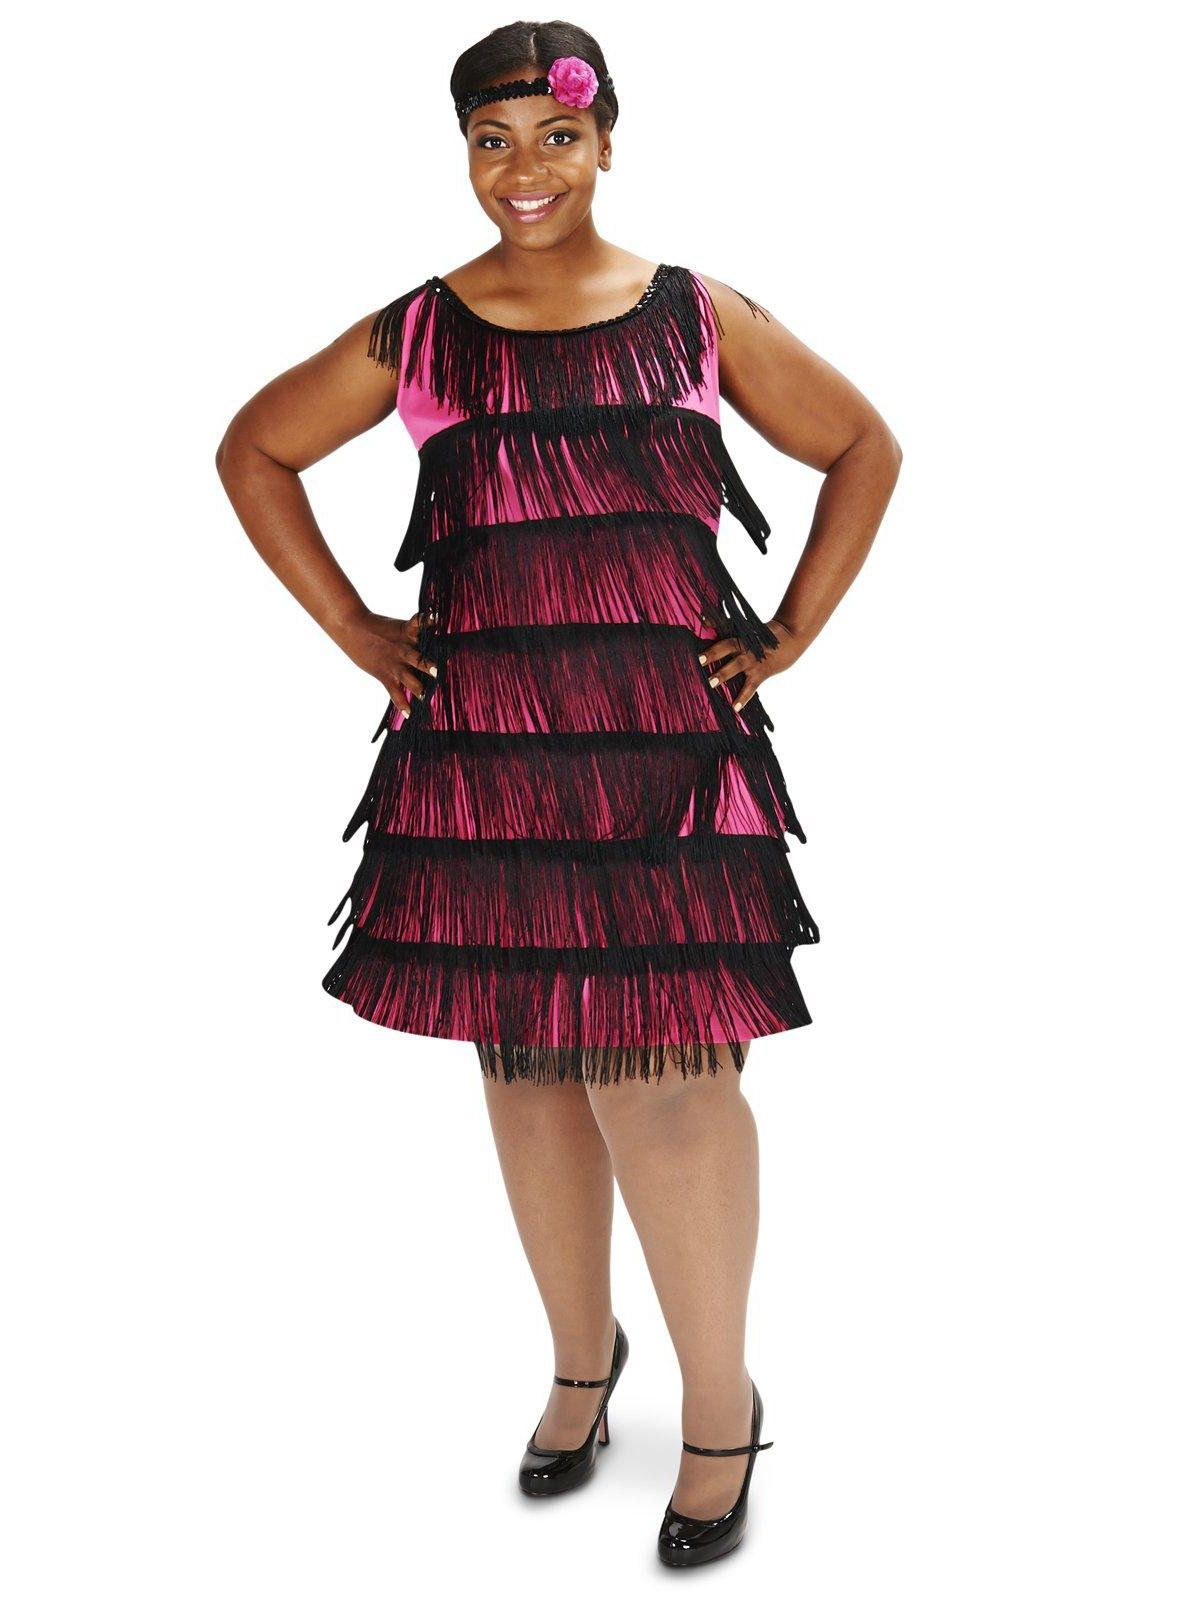 halloween costumes plus sizes mens #costumes #halloween #mens #plus #sizes #halloweencostumesmen